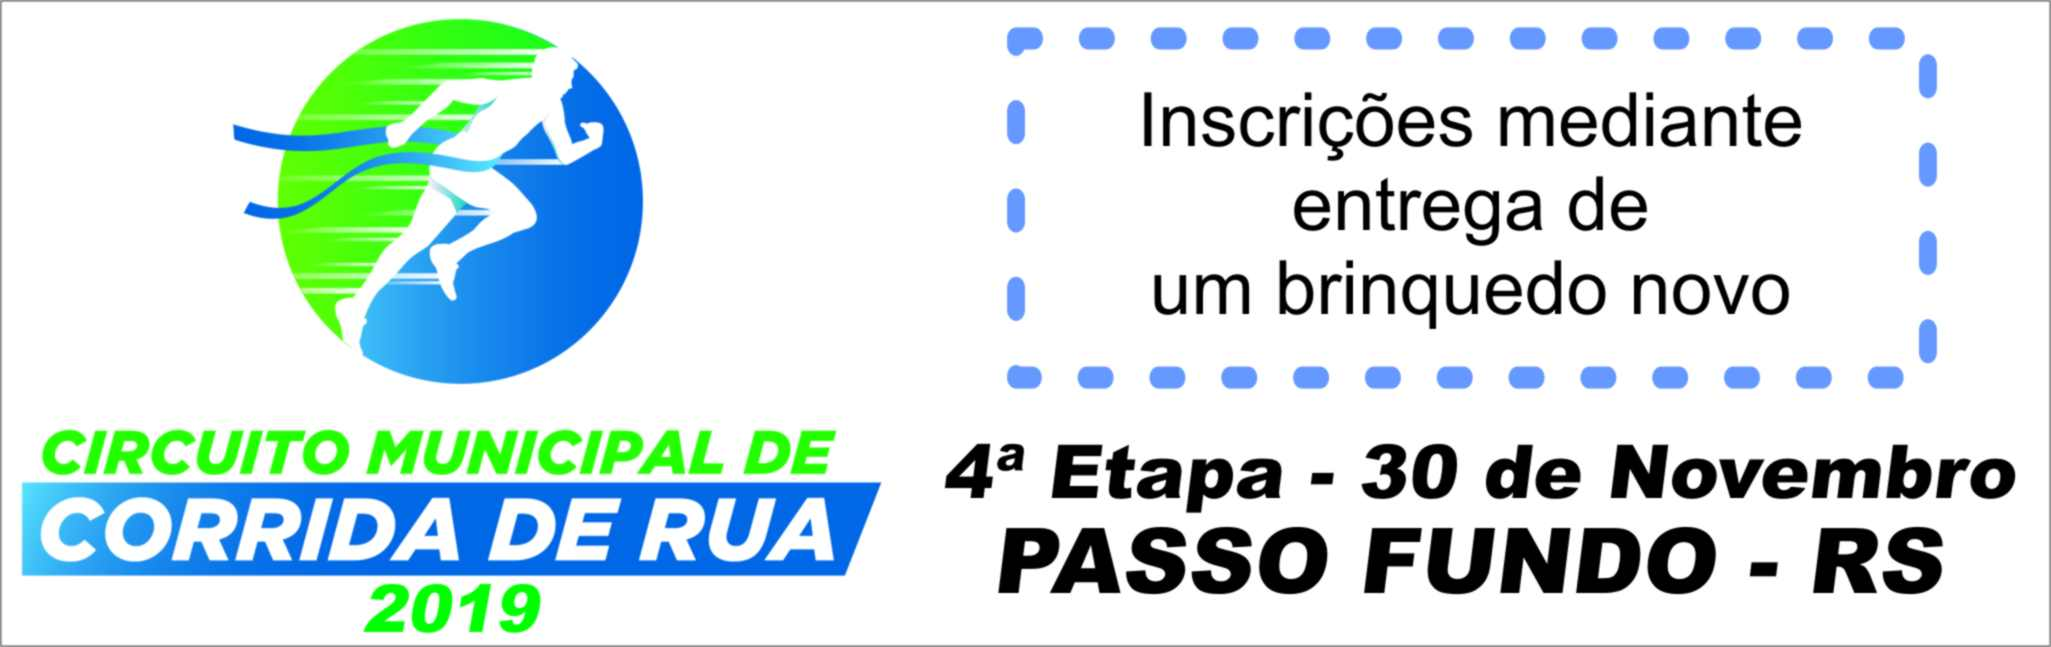 4ª Etapa Circuito Municipal de Corrida De Rua - Prefeitura de Passo Fundo - Rádio Uirapuru